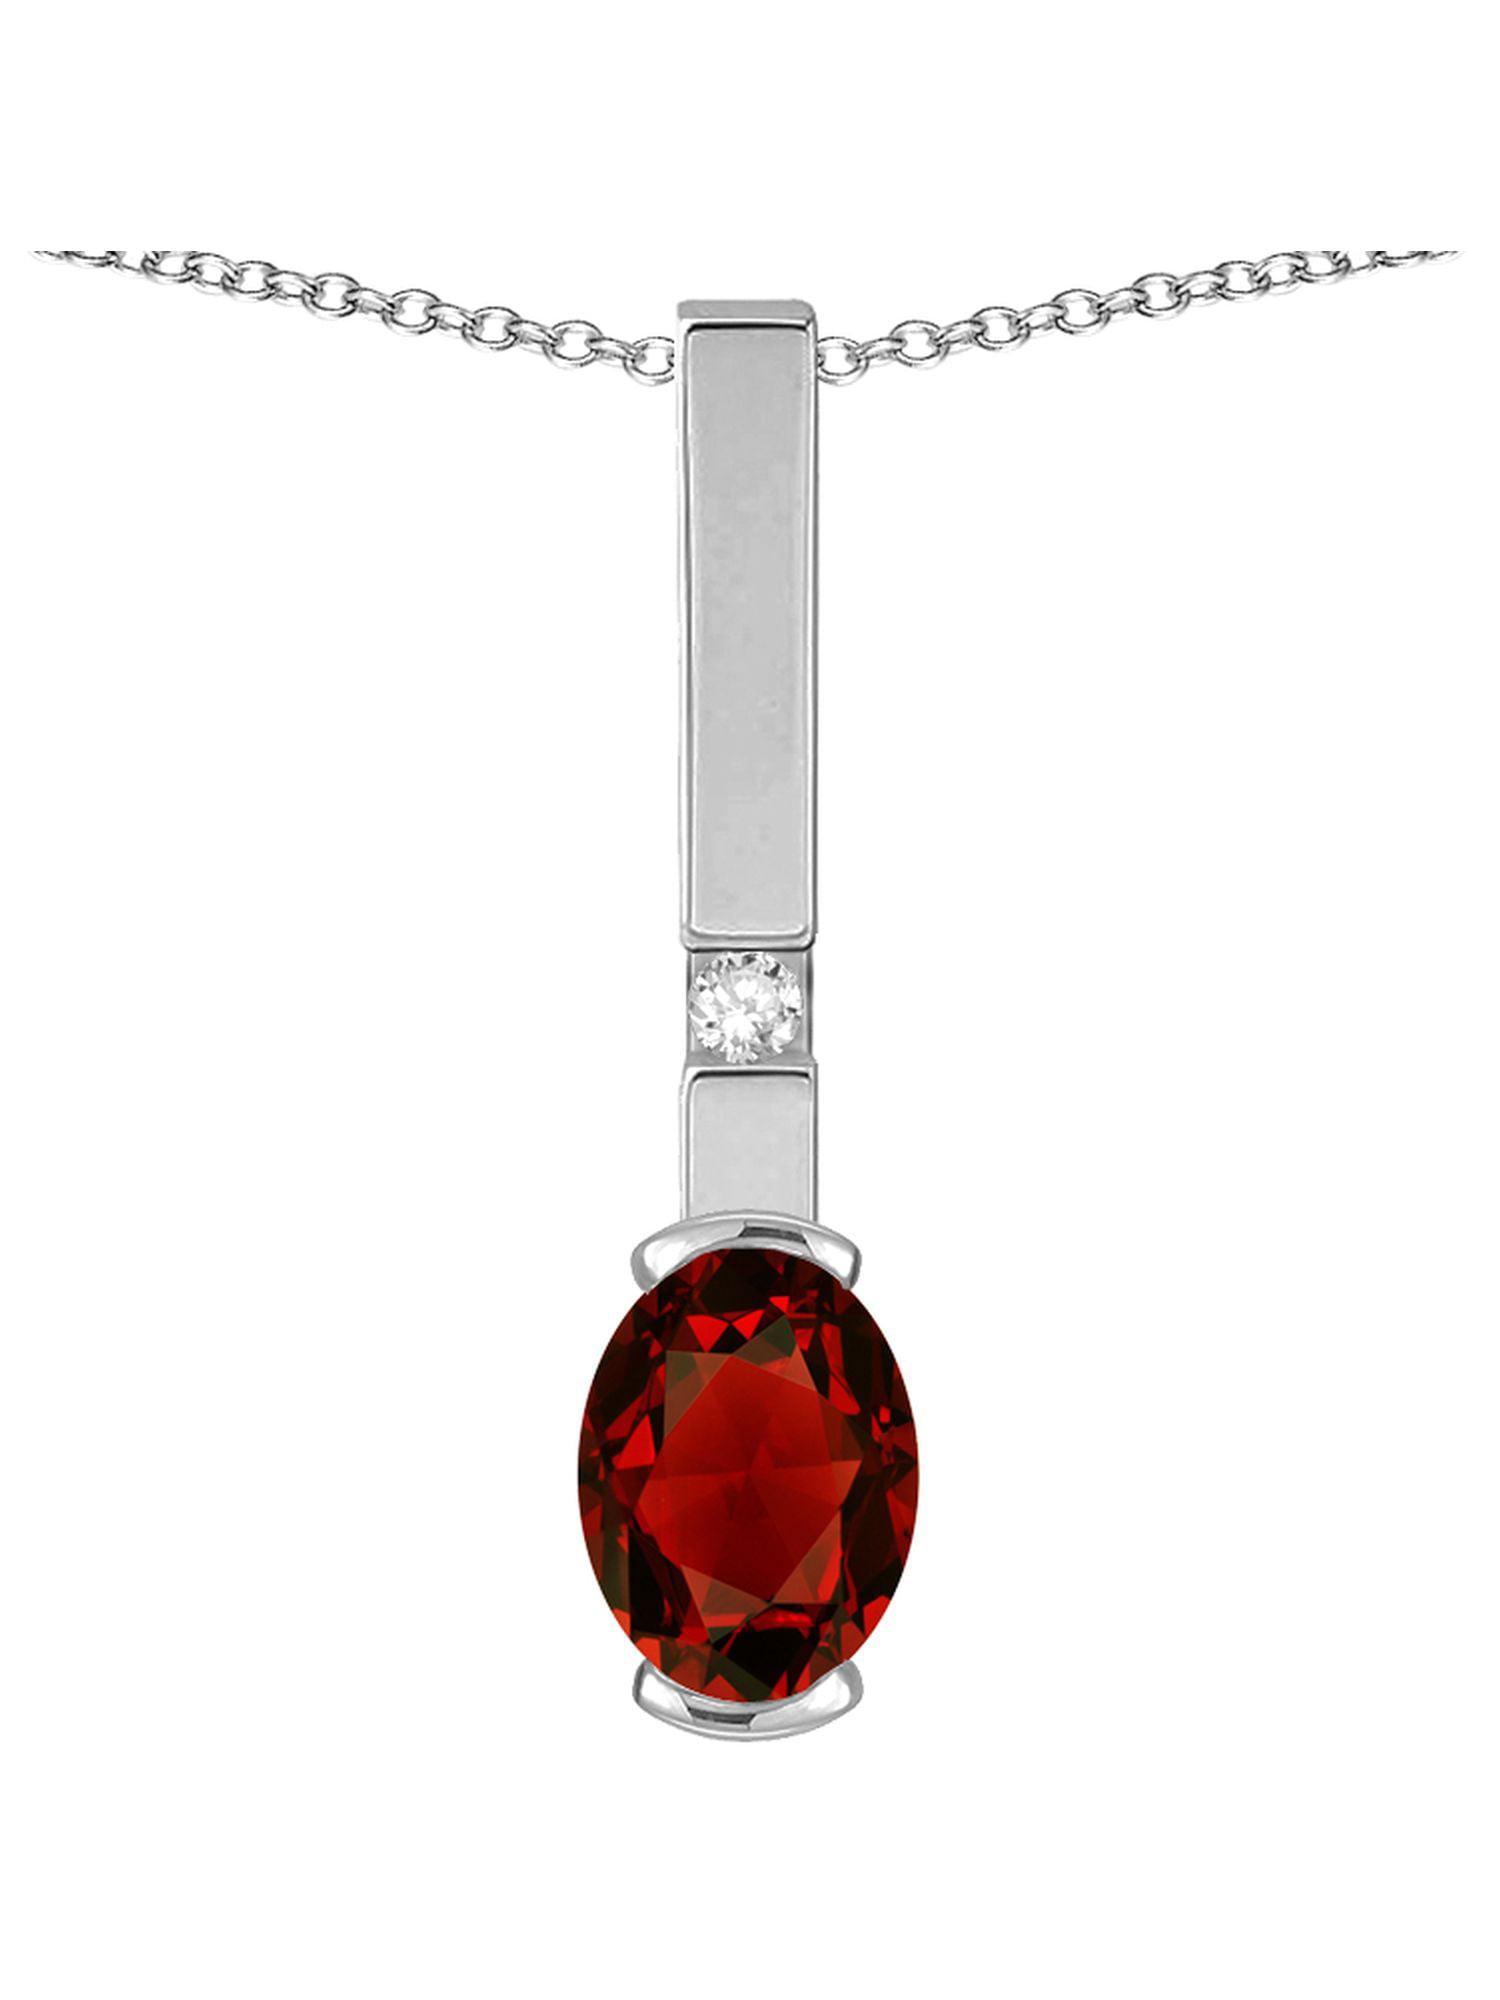 Star K Oval 8x6mm Genuine Garnet Bar Pendant Necklace by Star K